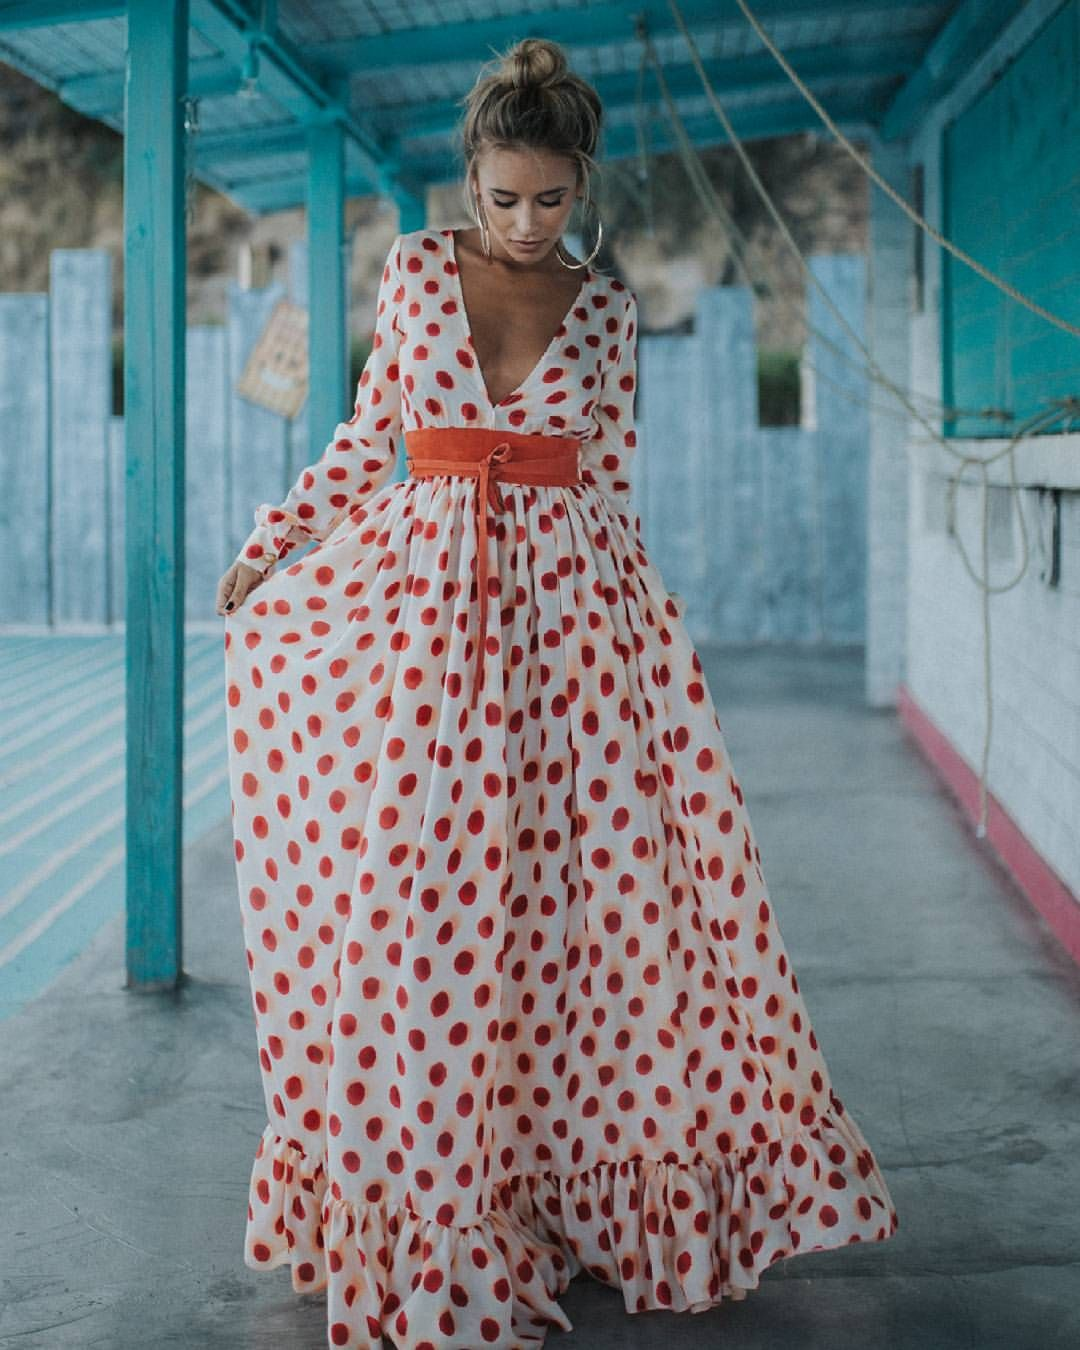 d35084fce Vestidos De Moda, Vestidos Largos, Trajes De Gitana, Ropa Gitana, Vestidos  De